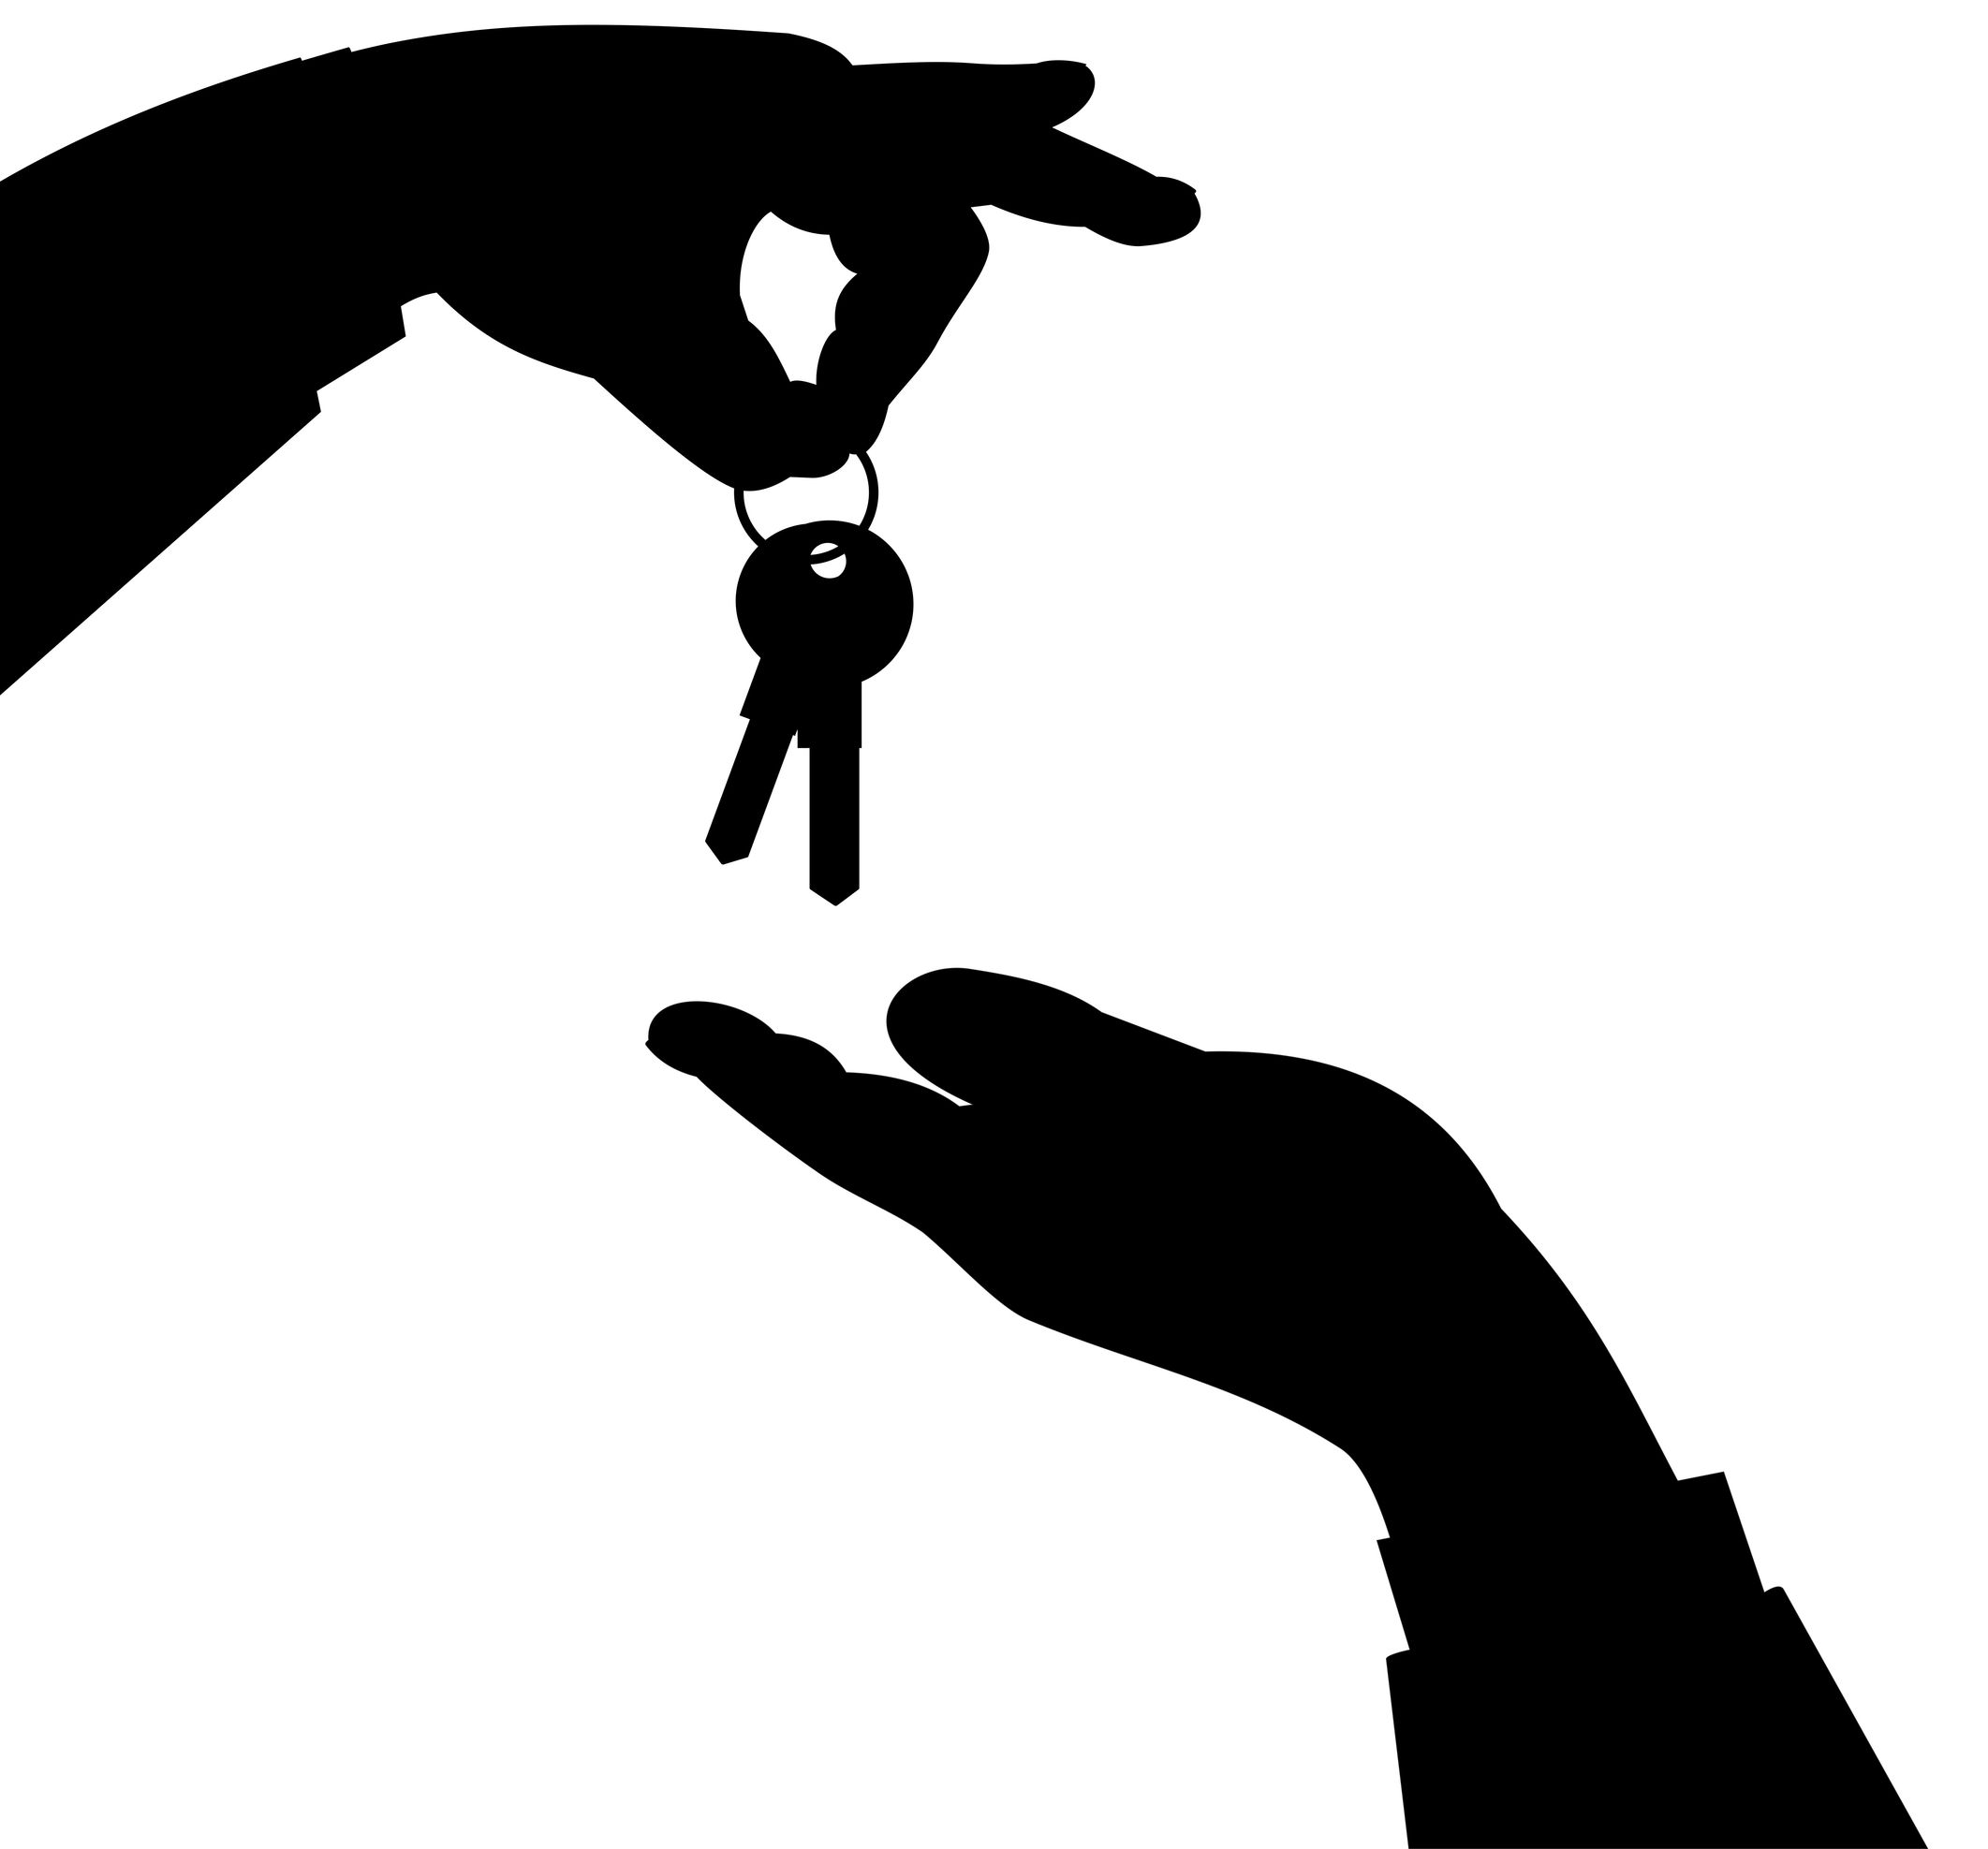 Keys_image_small